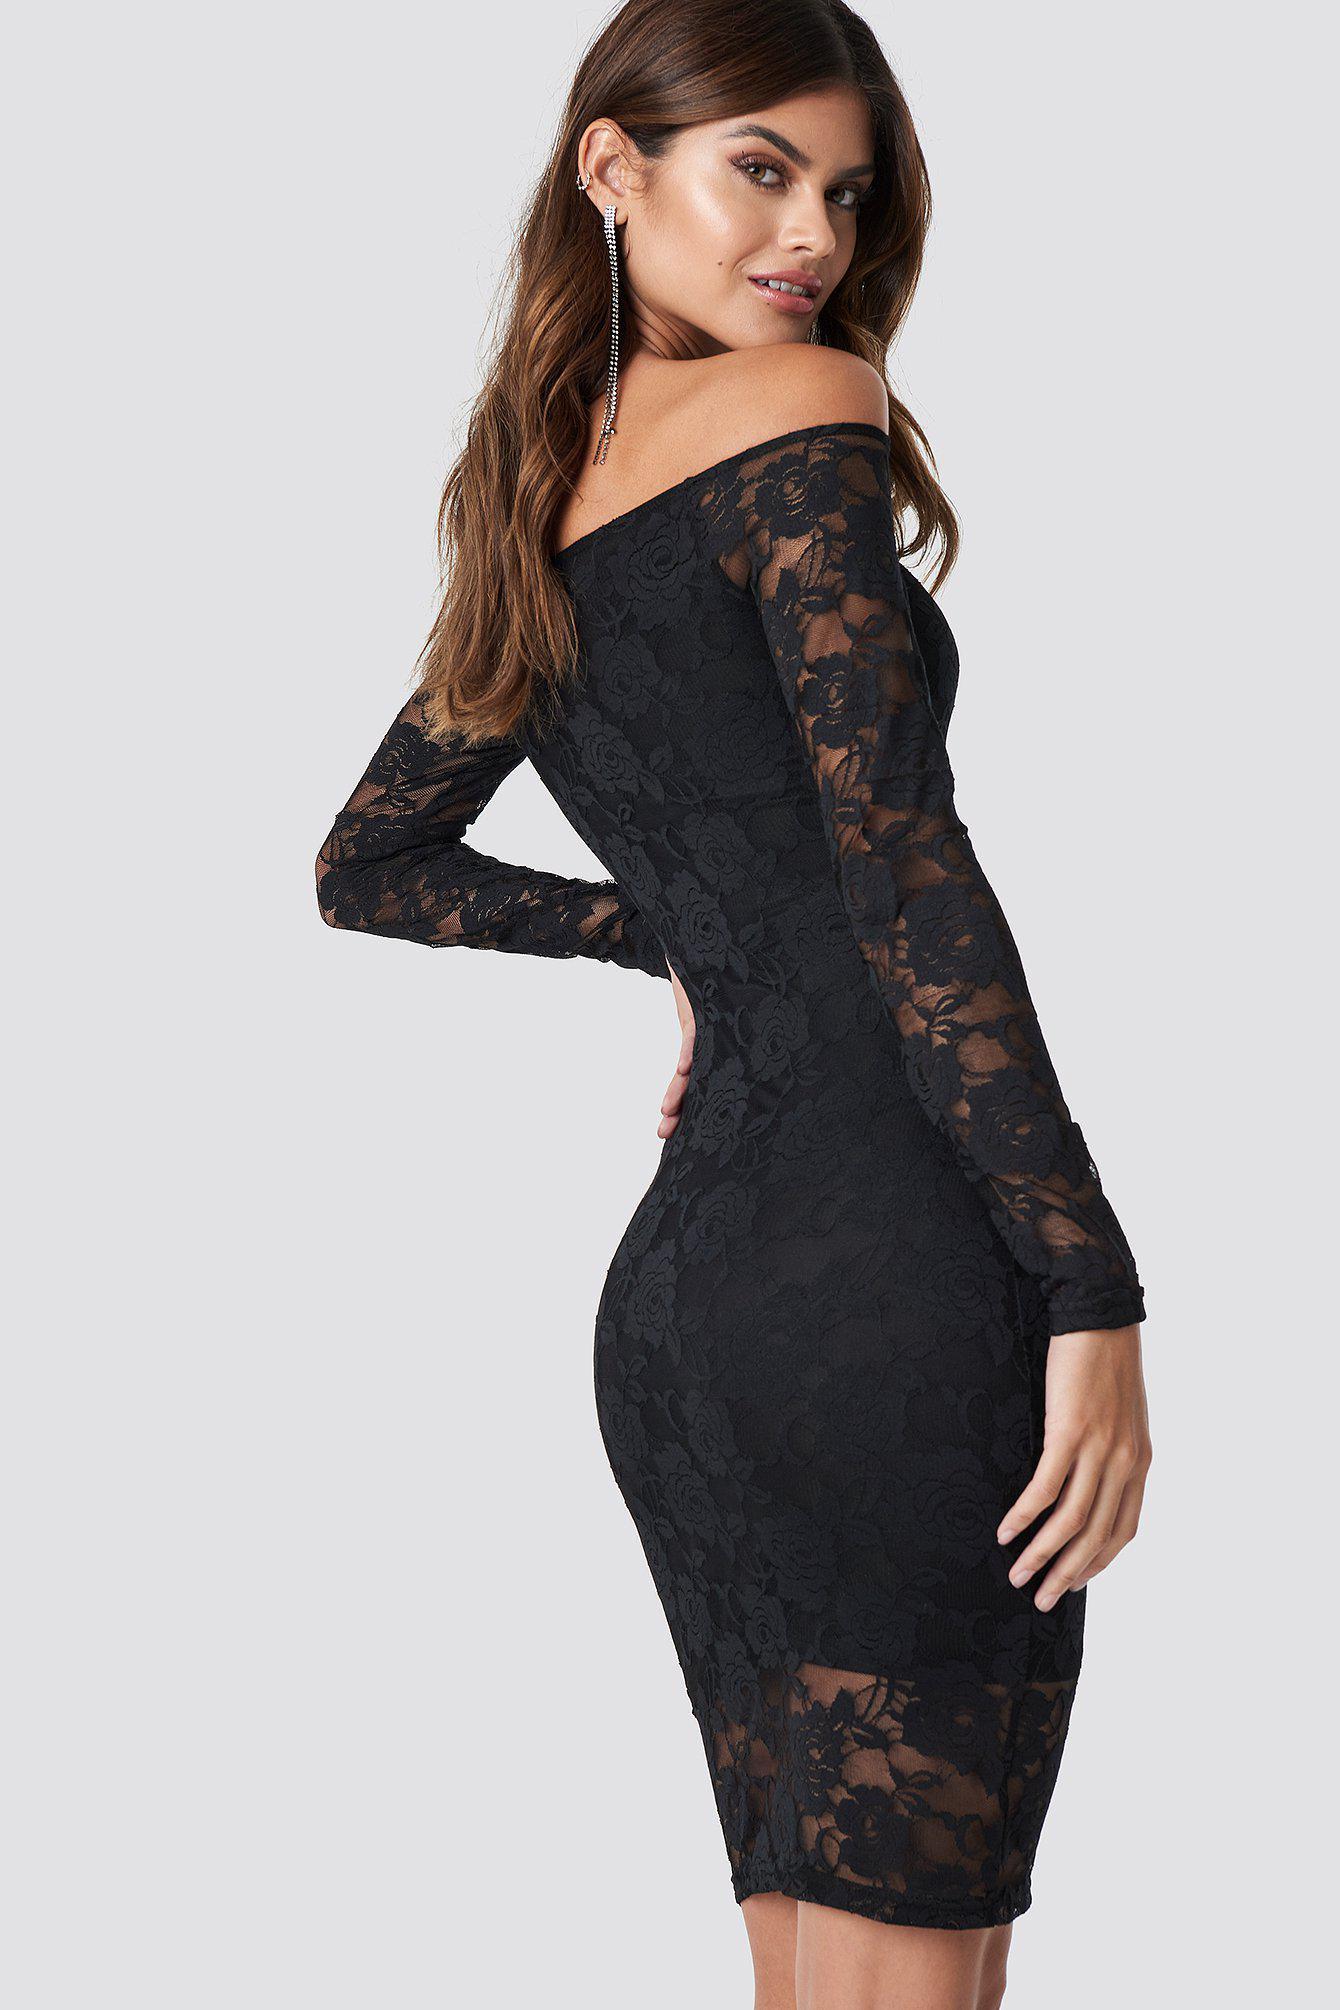 5f756c1523a NA-KD - Off Shoulder Lace Dress Black - Lyst. View fullscreen